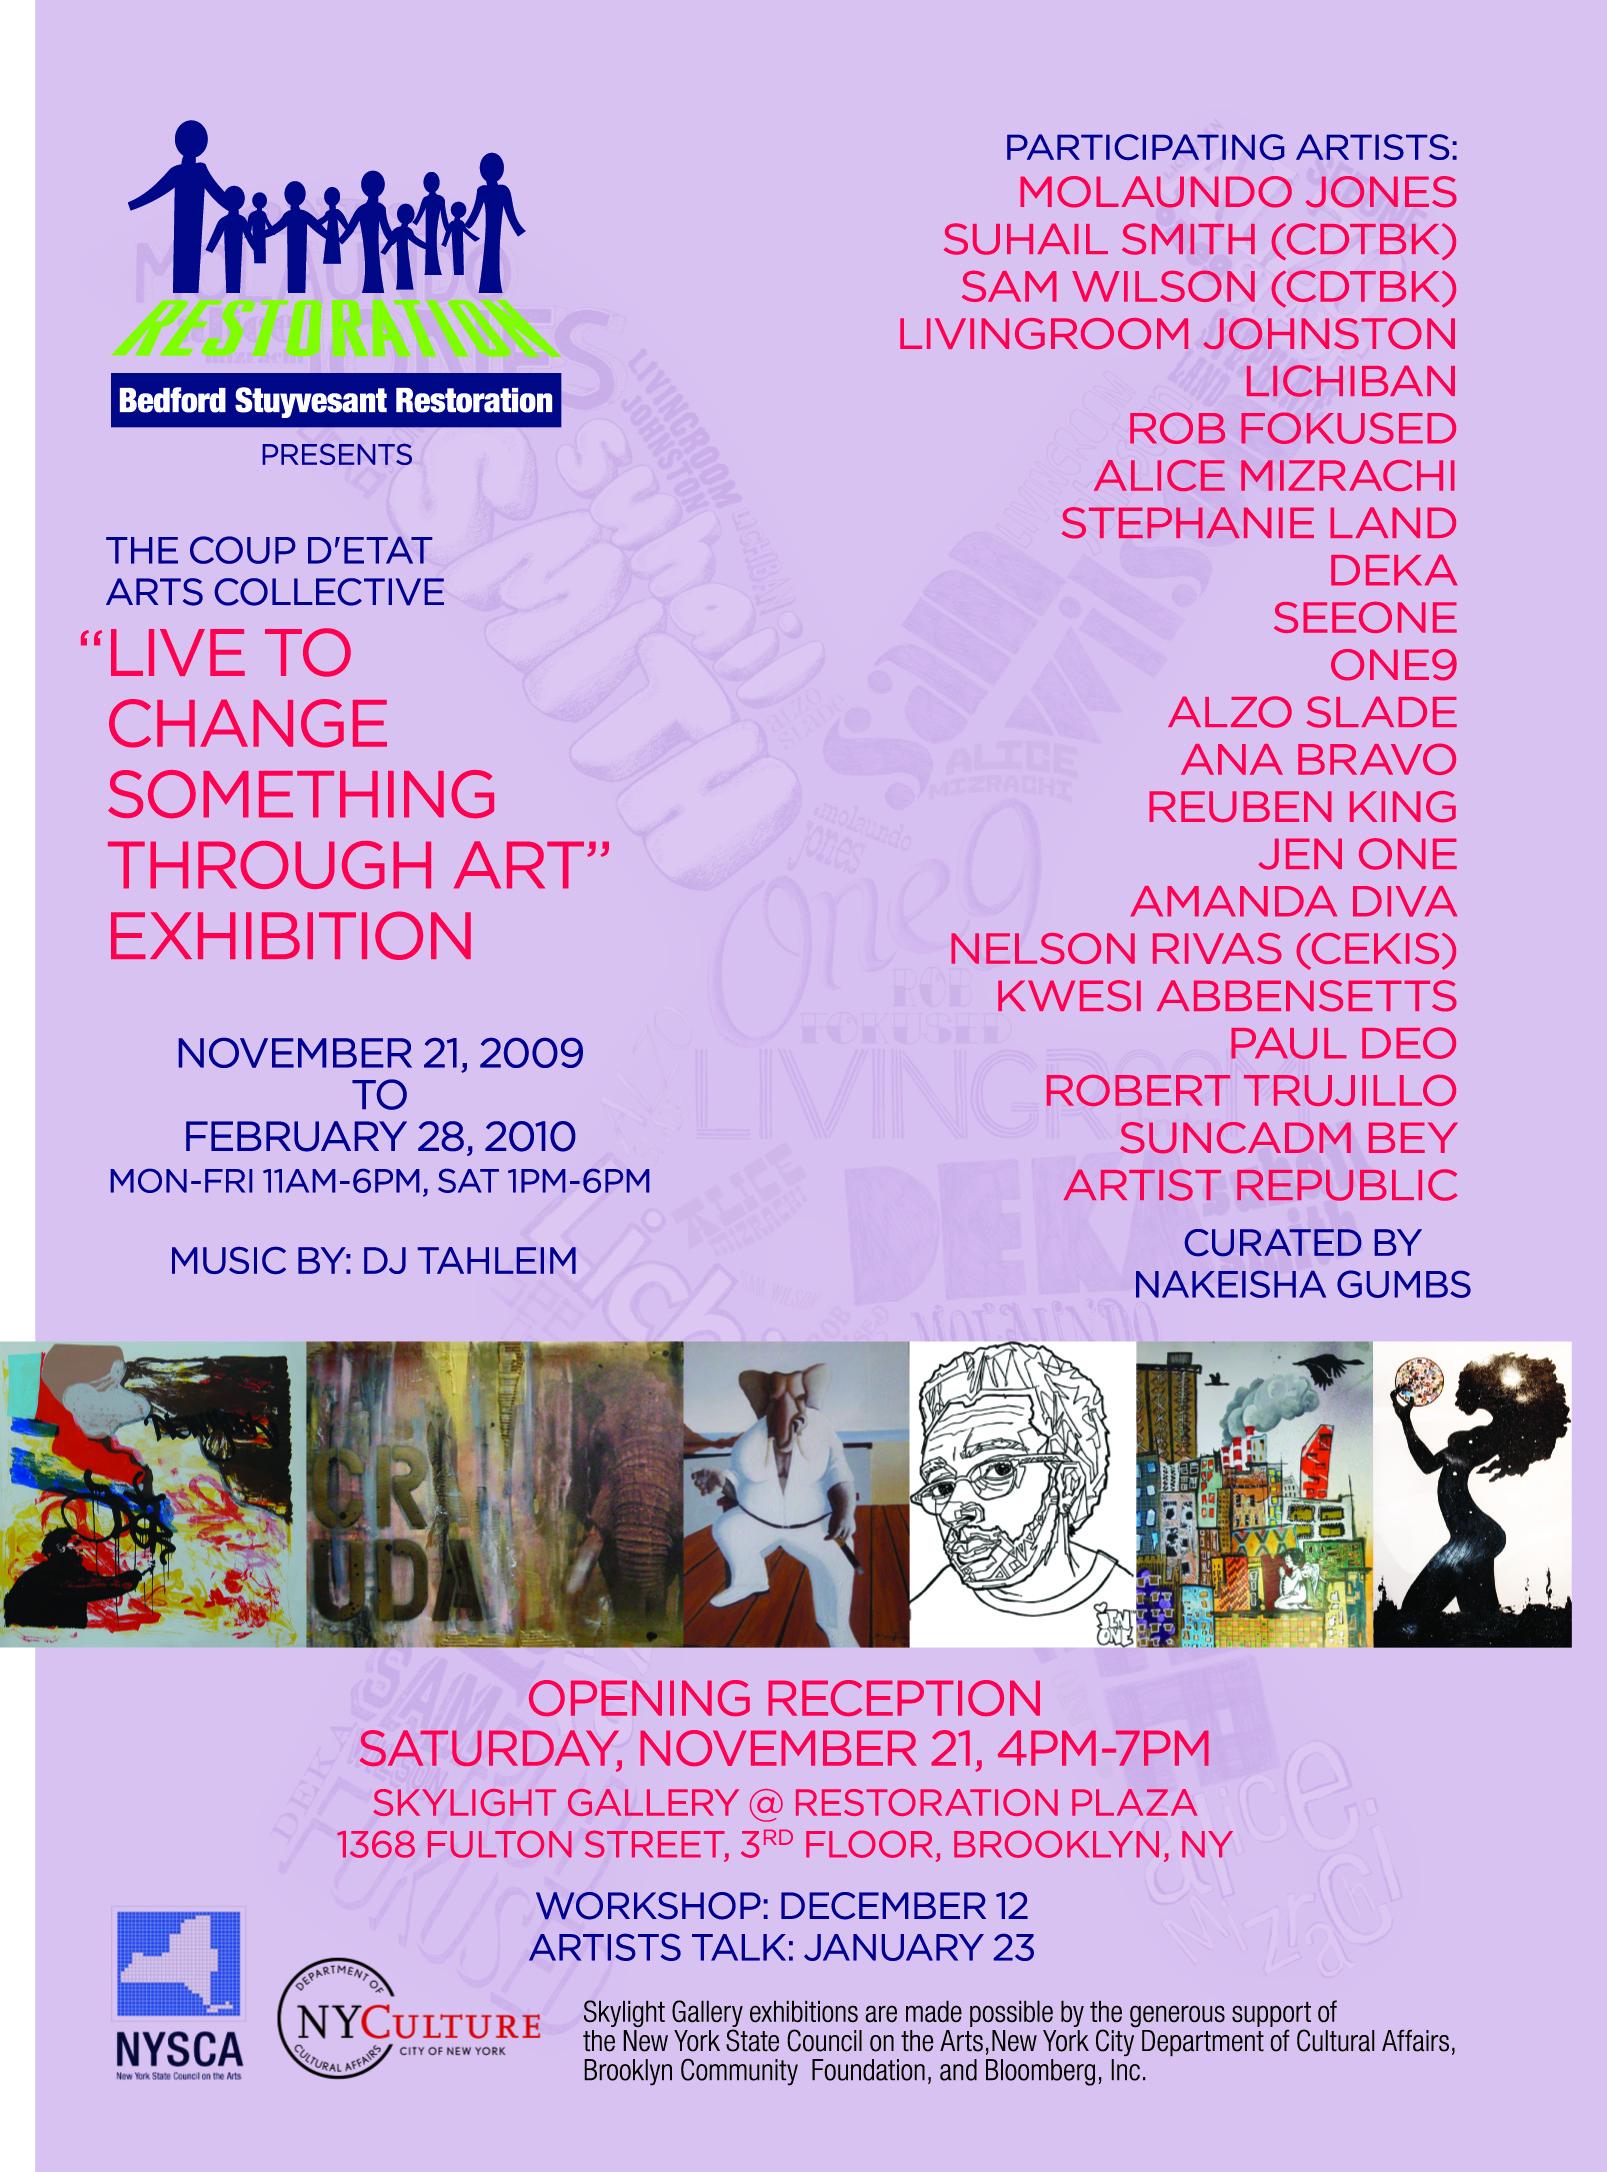 live to change something through art 11 21 09 alice mizrachi come